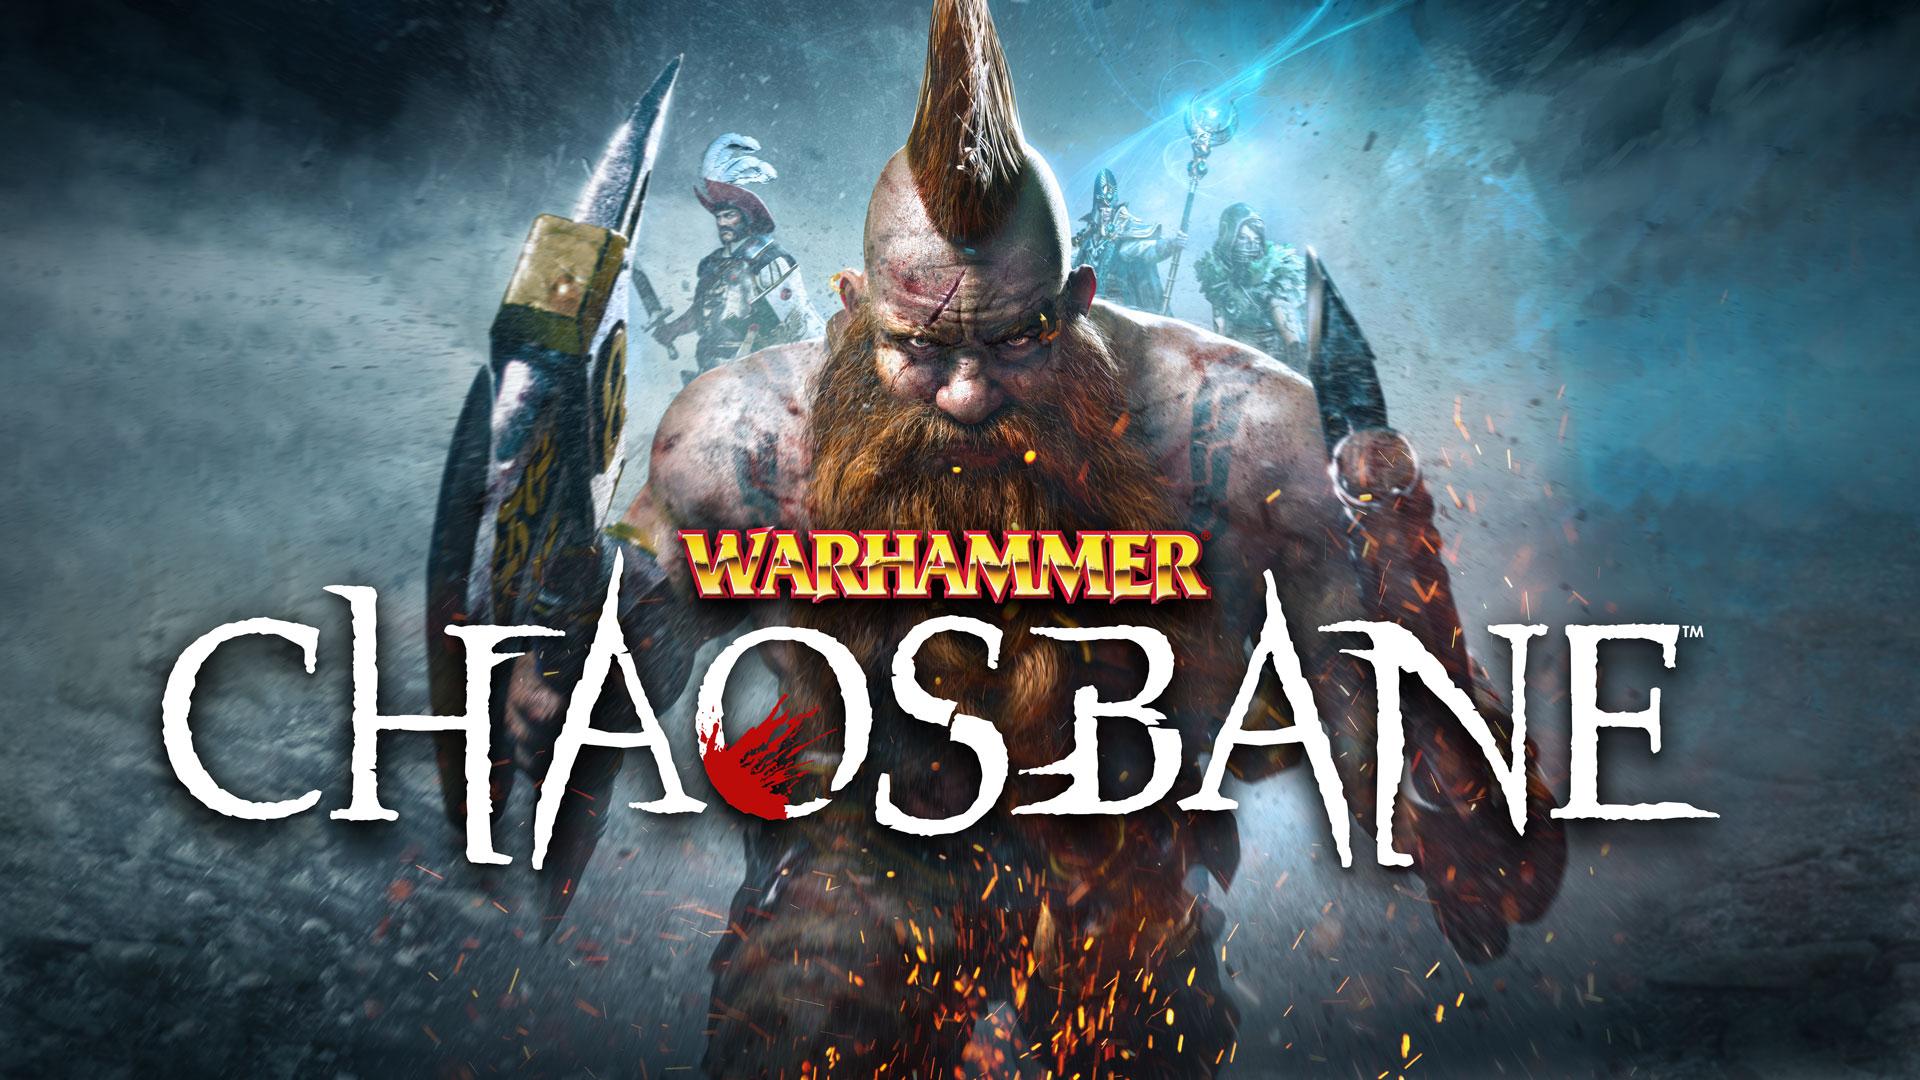 Warhammer: Chaosbane Wallpapers - PlayStation Universe